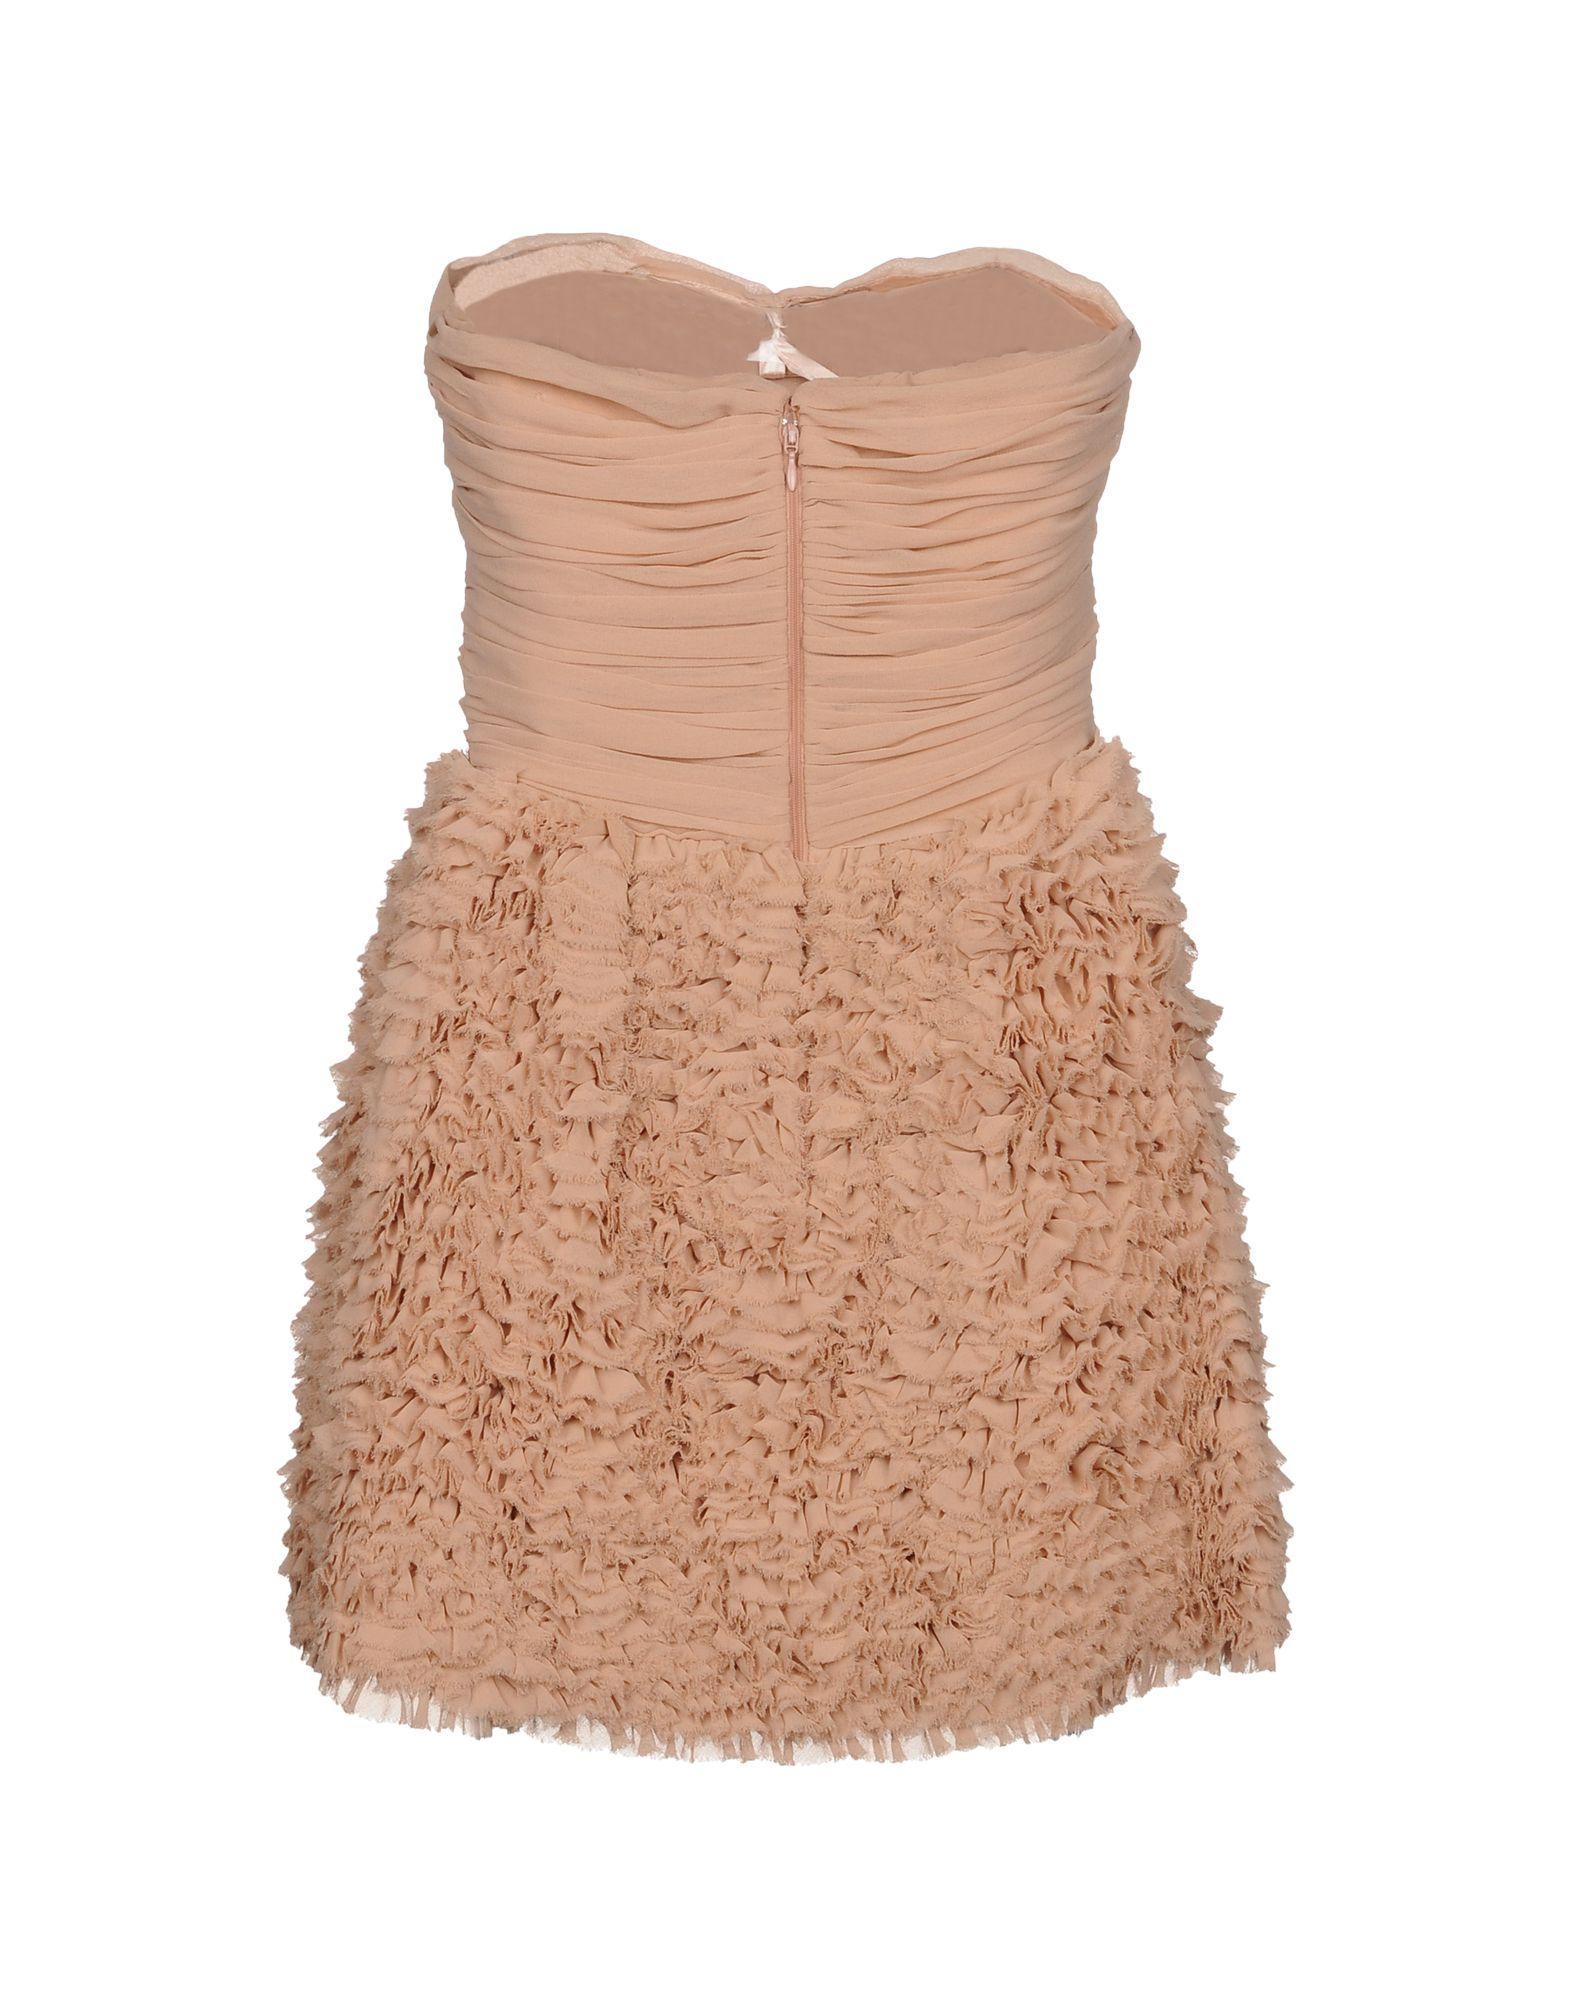 Elisabetta Franchi Gold Pale Pink Ruffled Strapless Dress